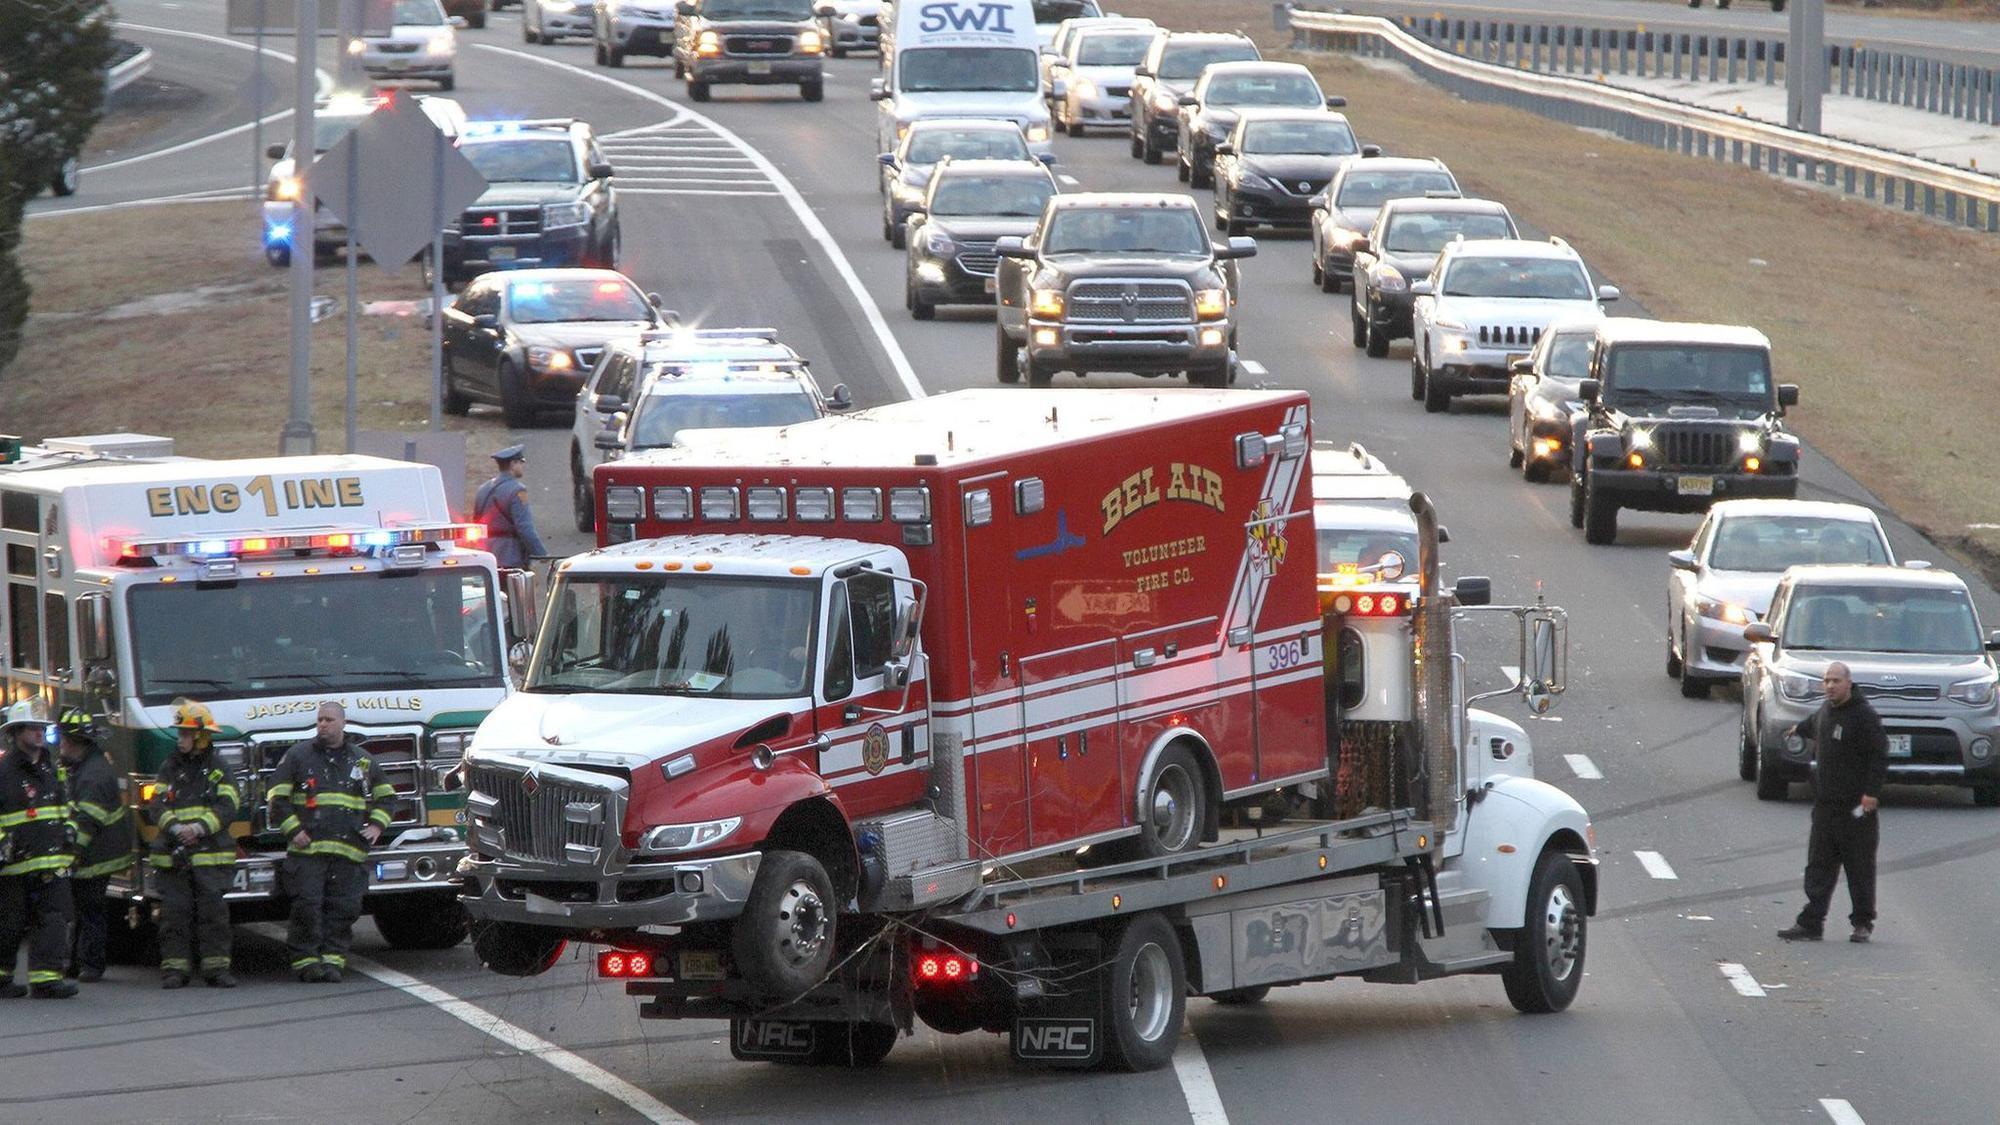 Bel Air Car >> Bel Air fire company ambulance damaged in N.J. crash - The Aegis